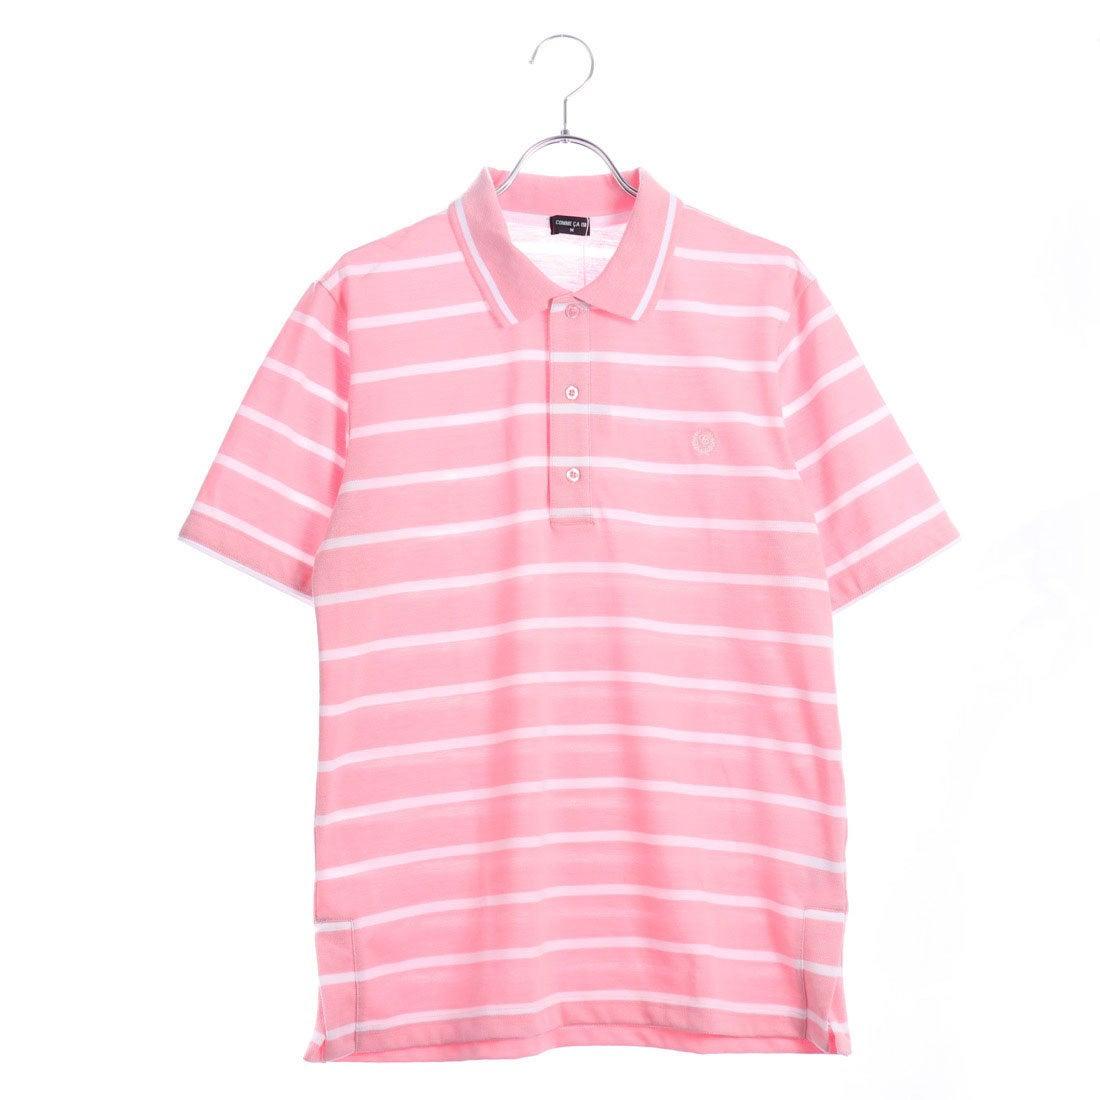 d6bb15f35741b コムサイズム COMME CA ISM ボーダーポロシャツ(大人サイズ) (ピンク) -アウトレット通販 ロコレット (LOCOLET)